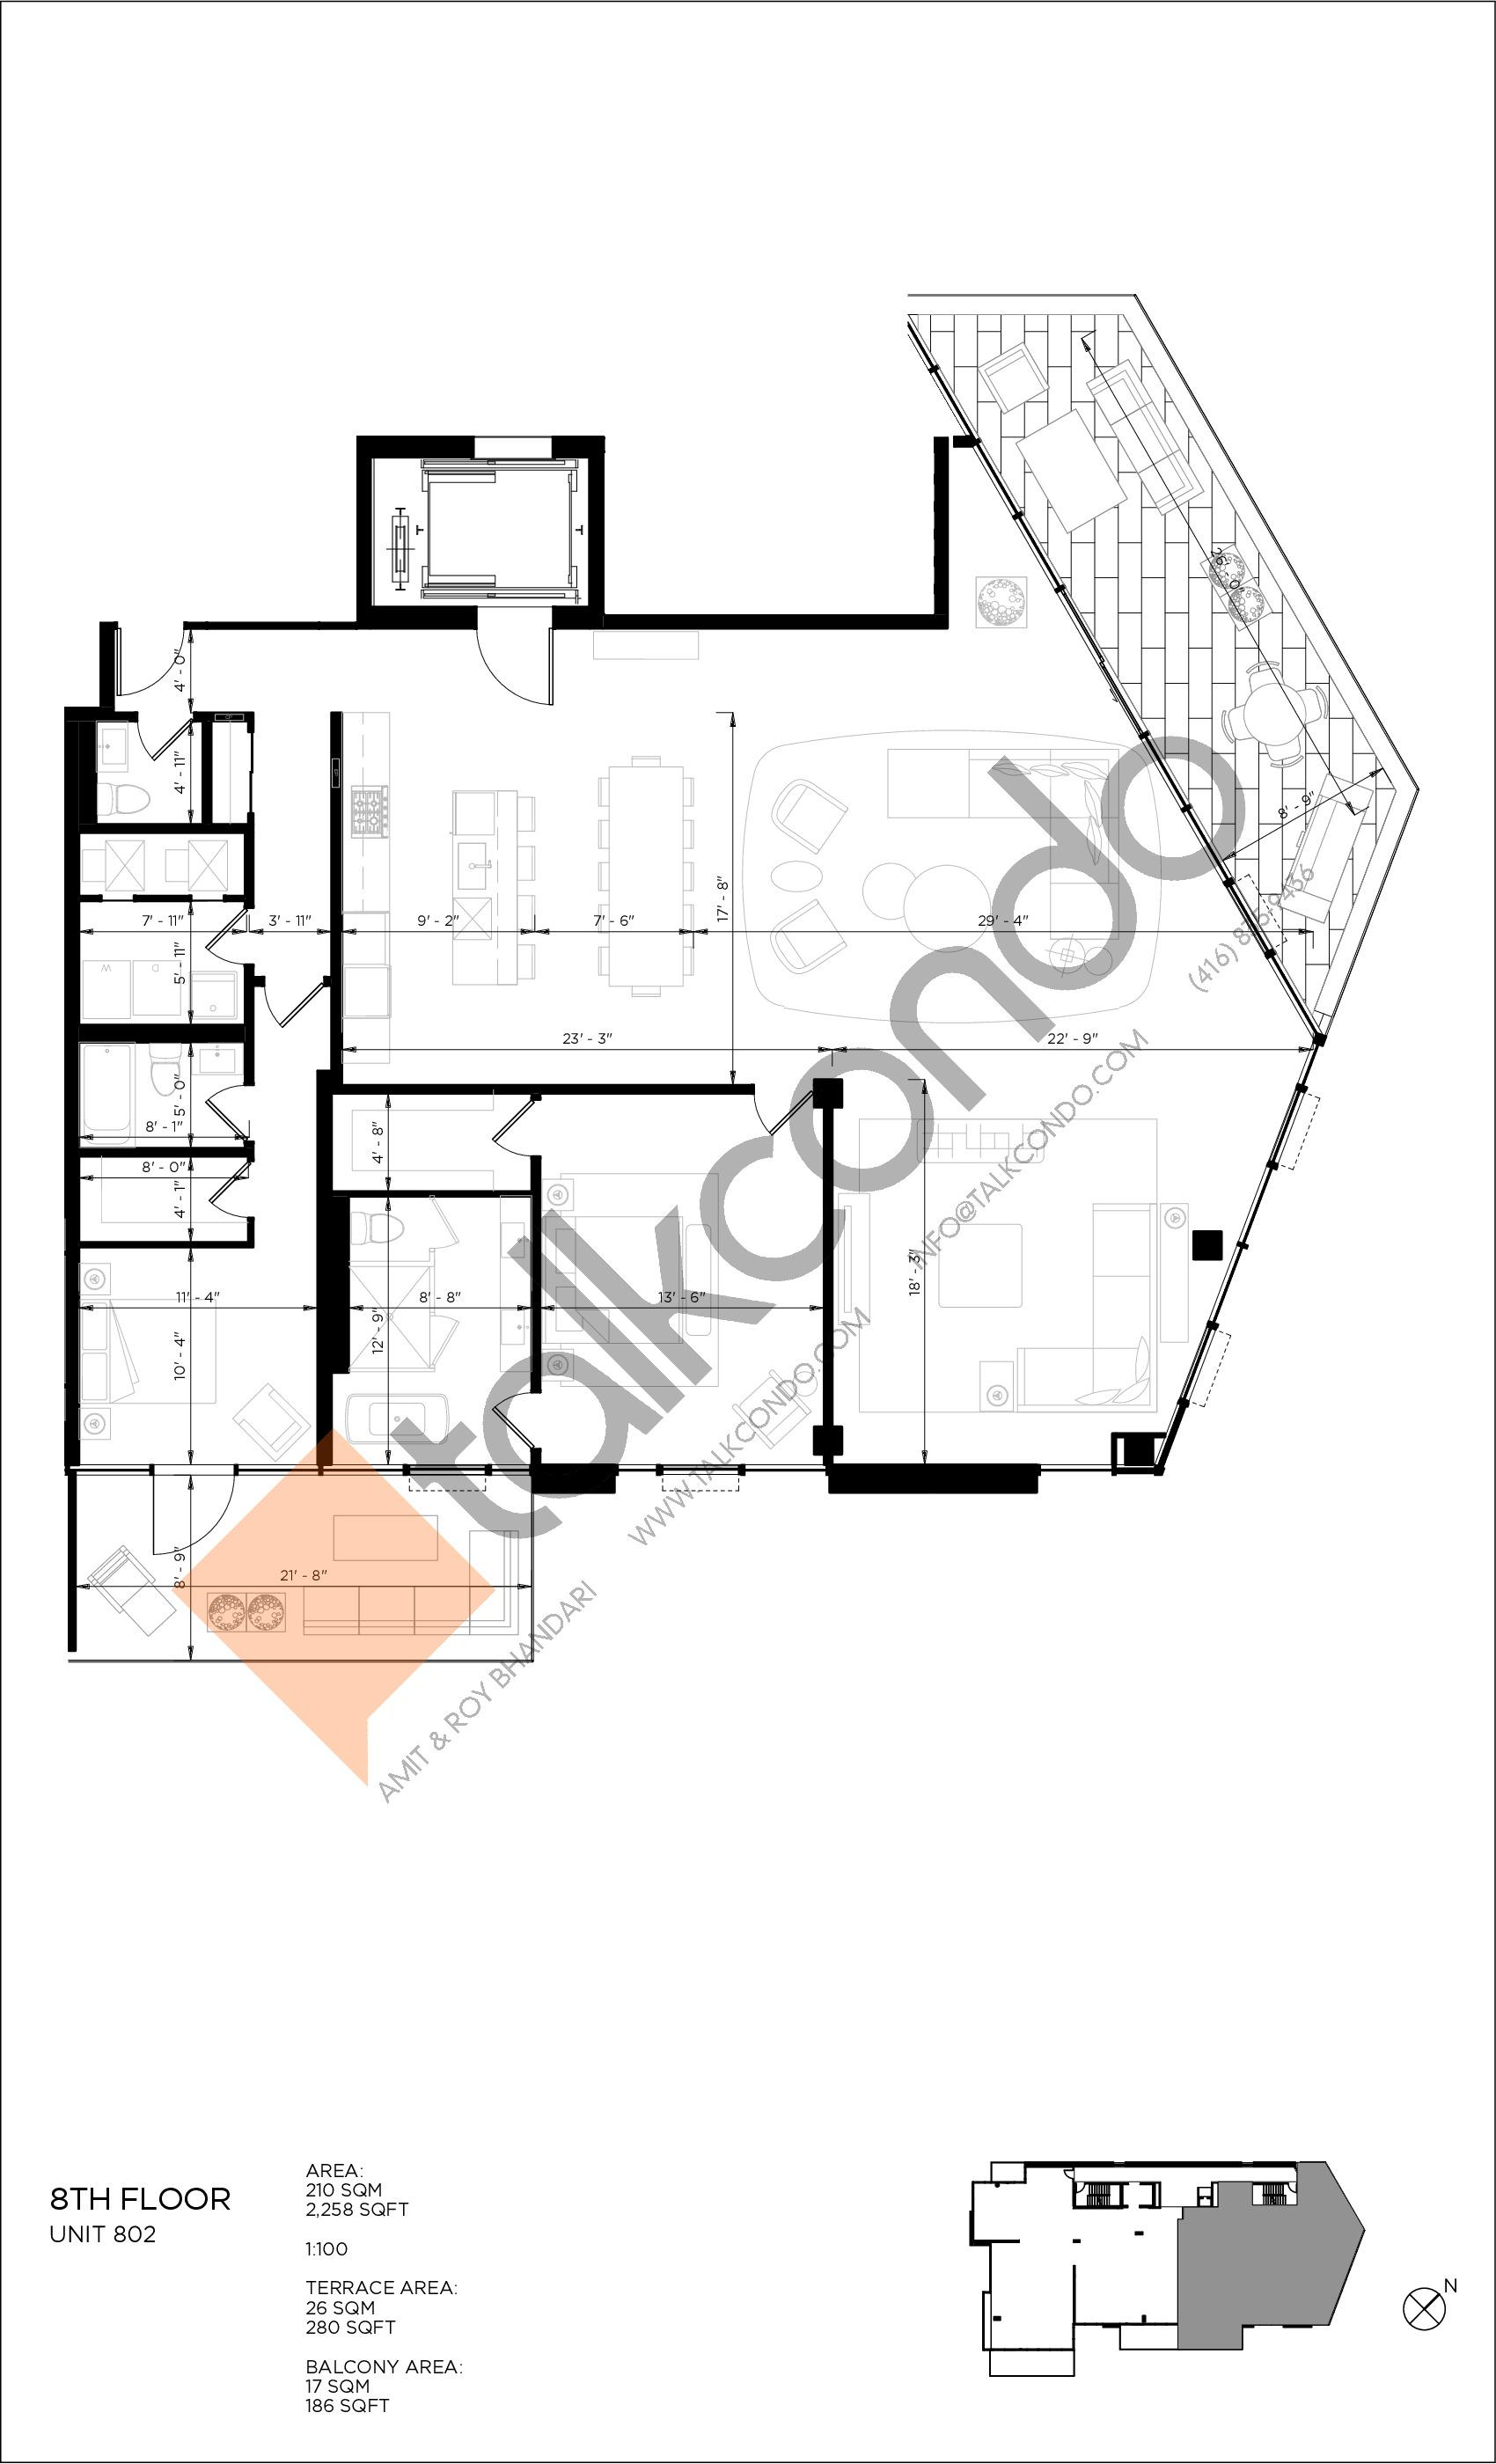 Unit 802 Floor Plan at 346 Davenport Condos - 2258 sq.ft